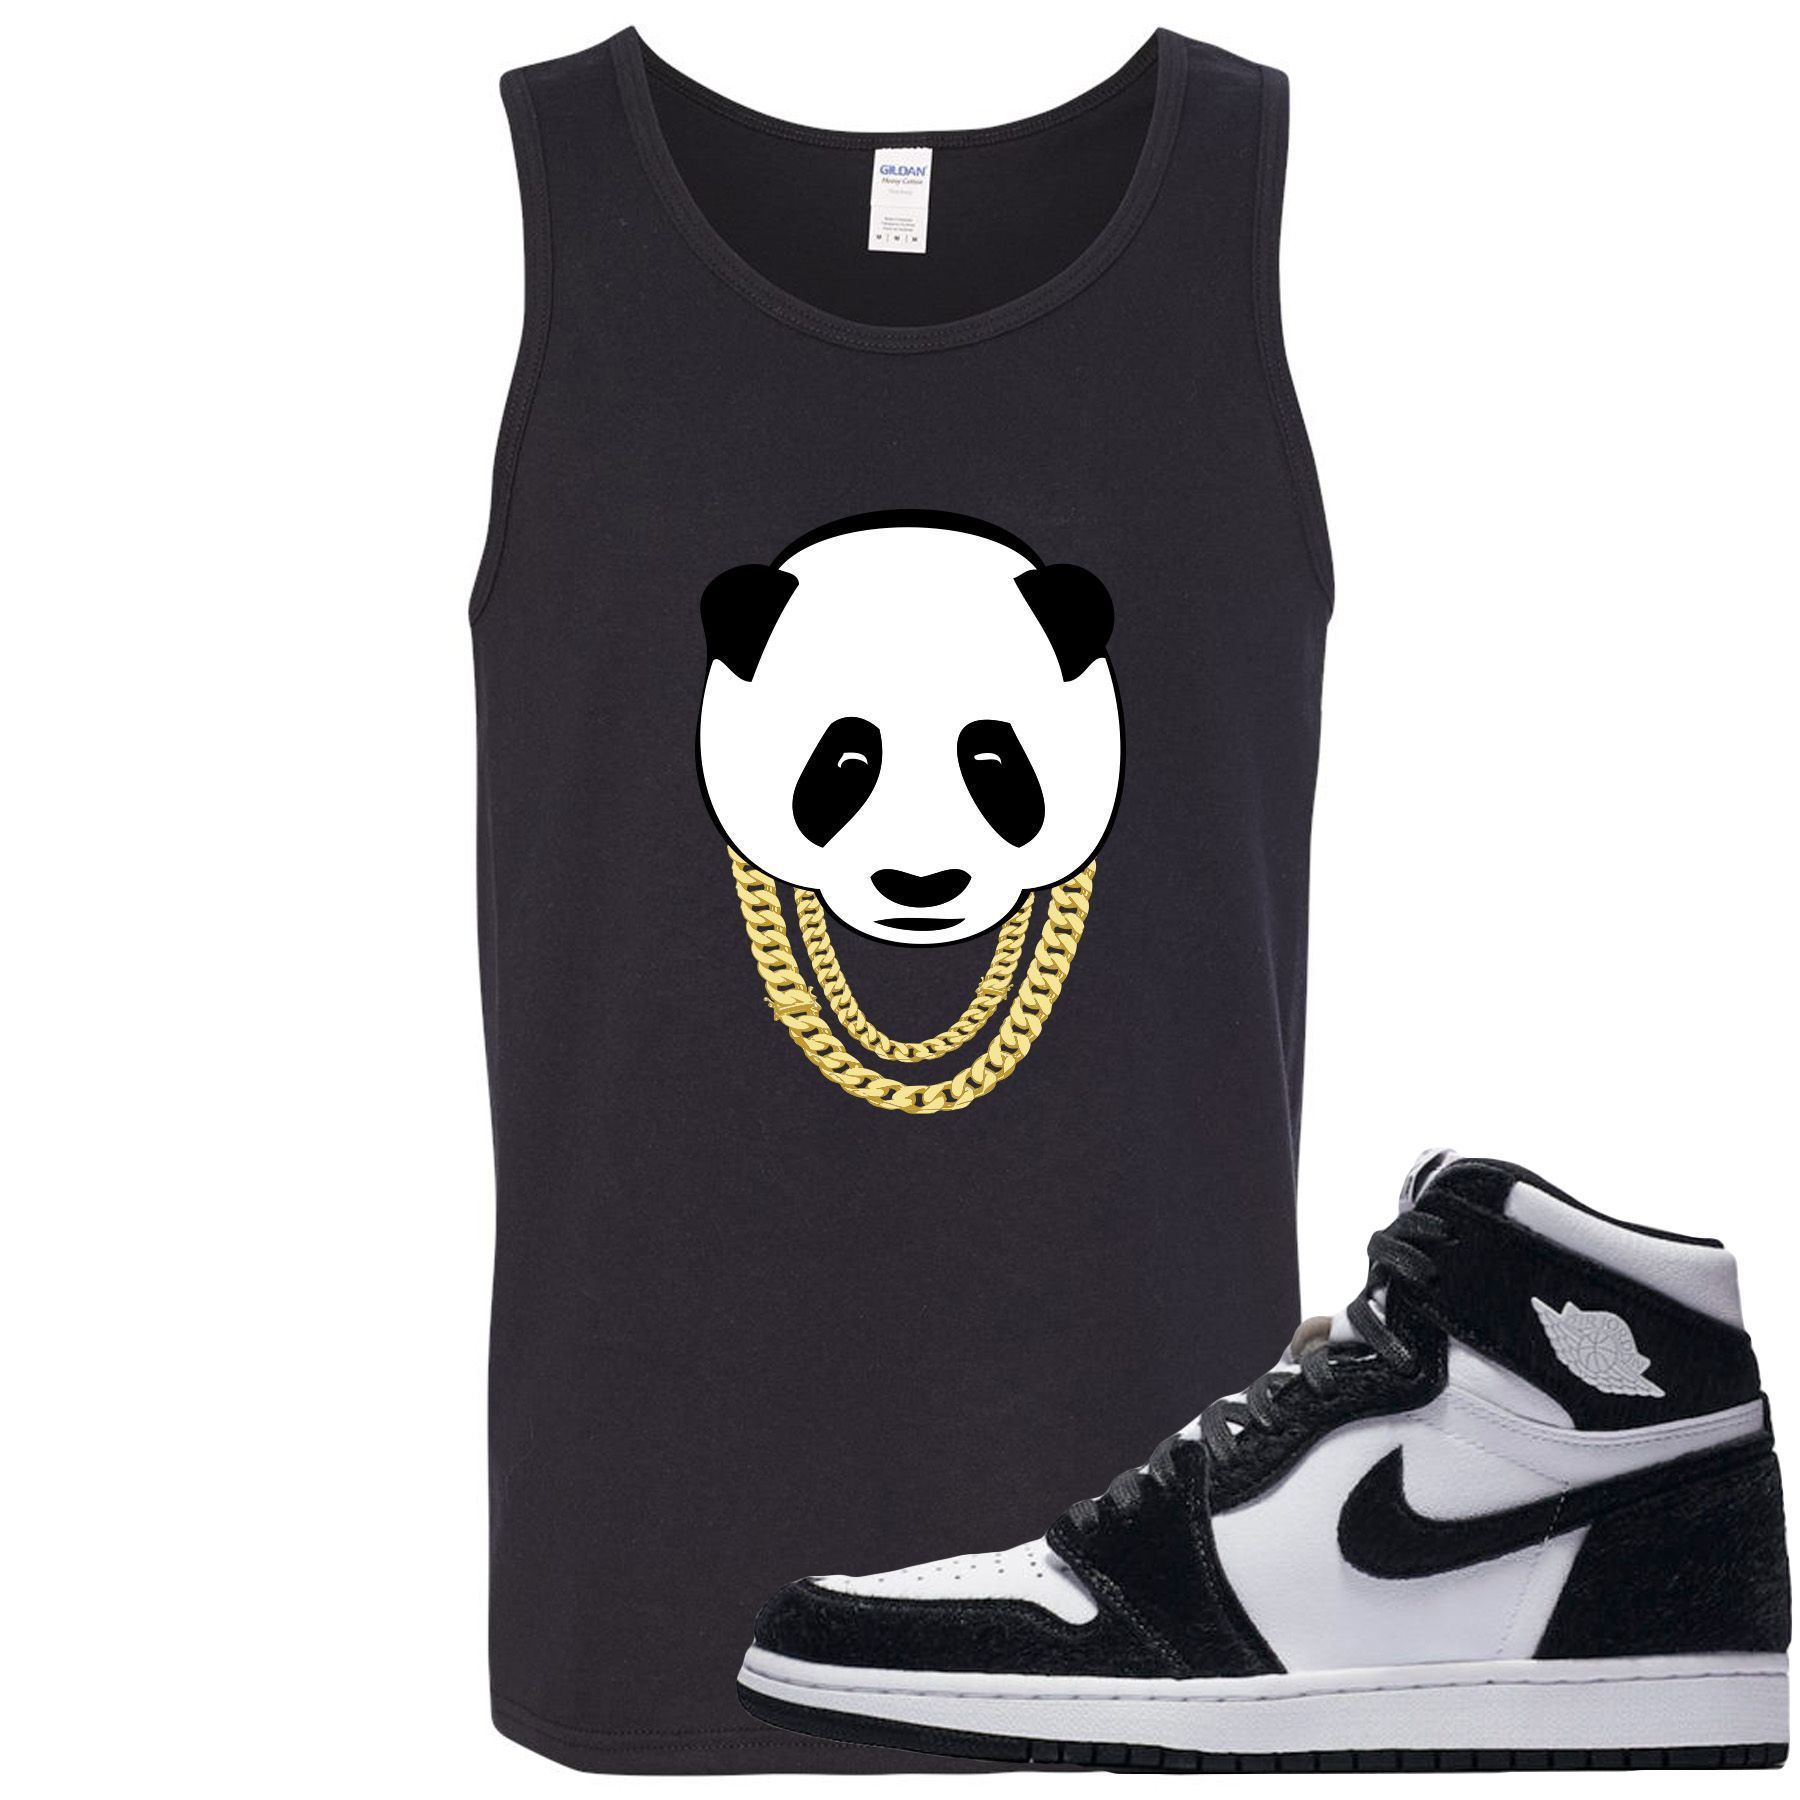 Jordan 1 Retro High OG WMNS Panda Sneaker Hook Up Panda